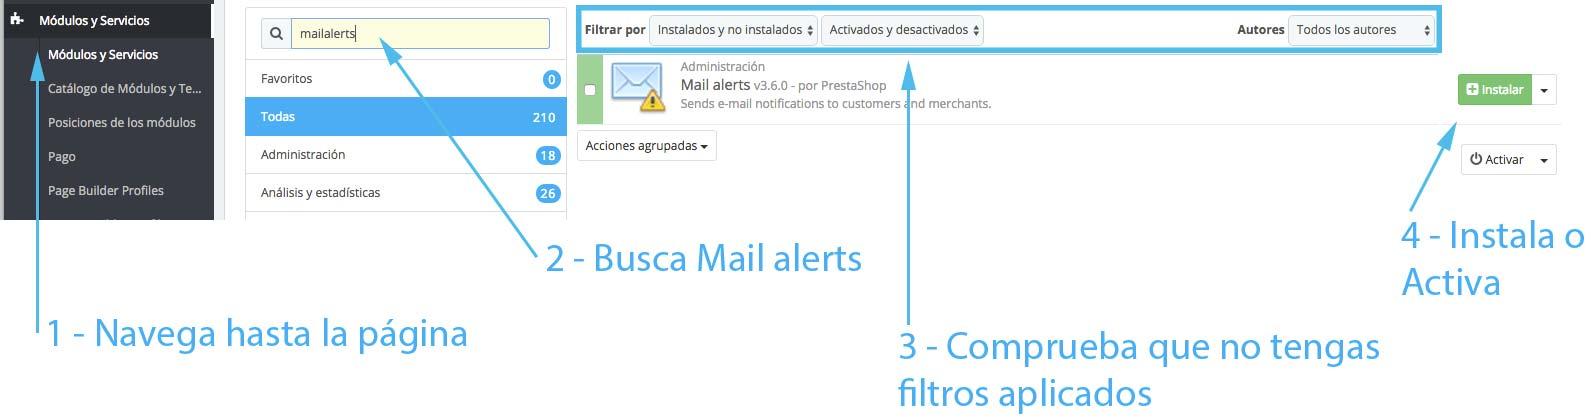 Instalar o Activar Mail Alerts